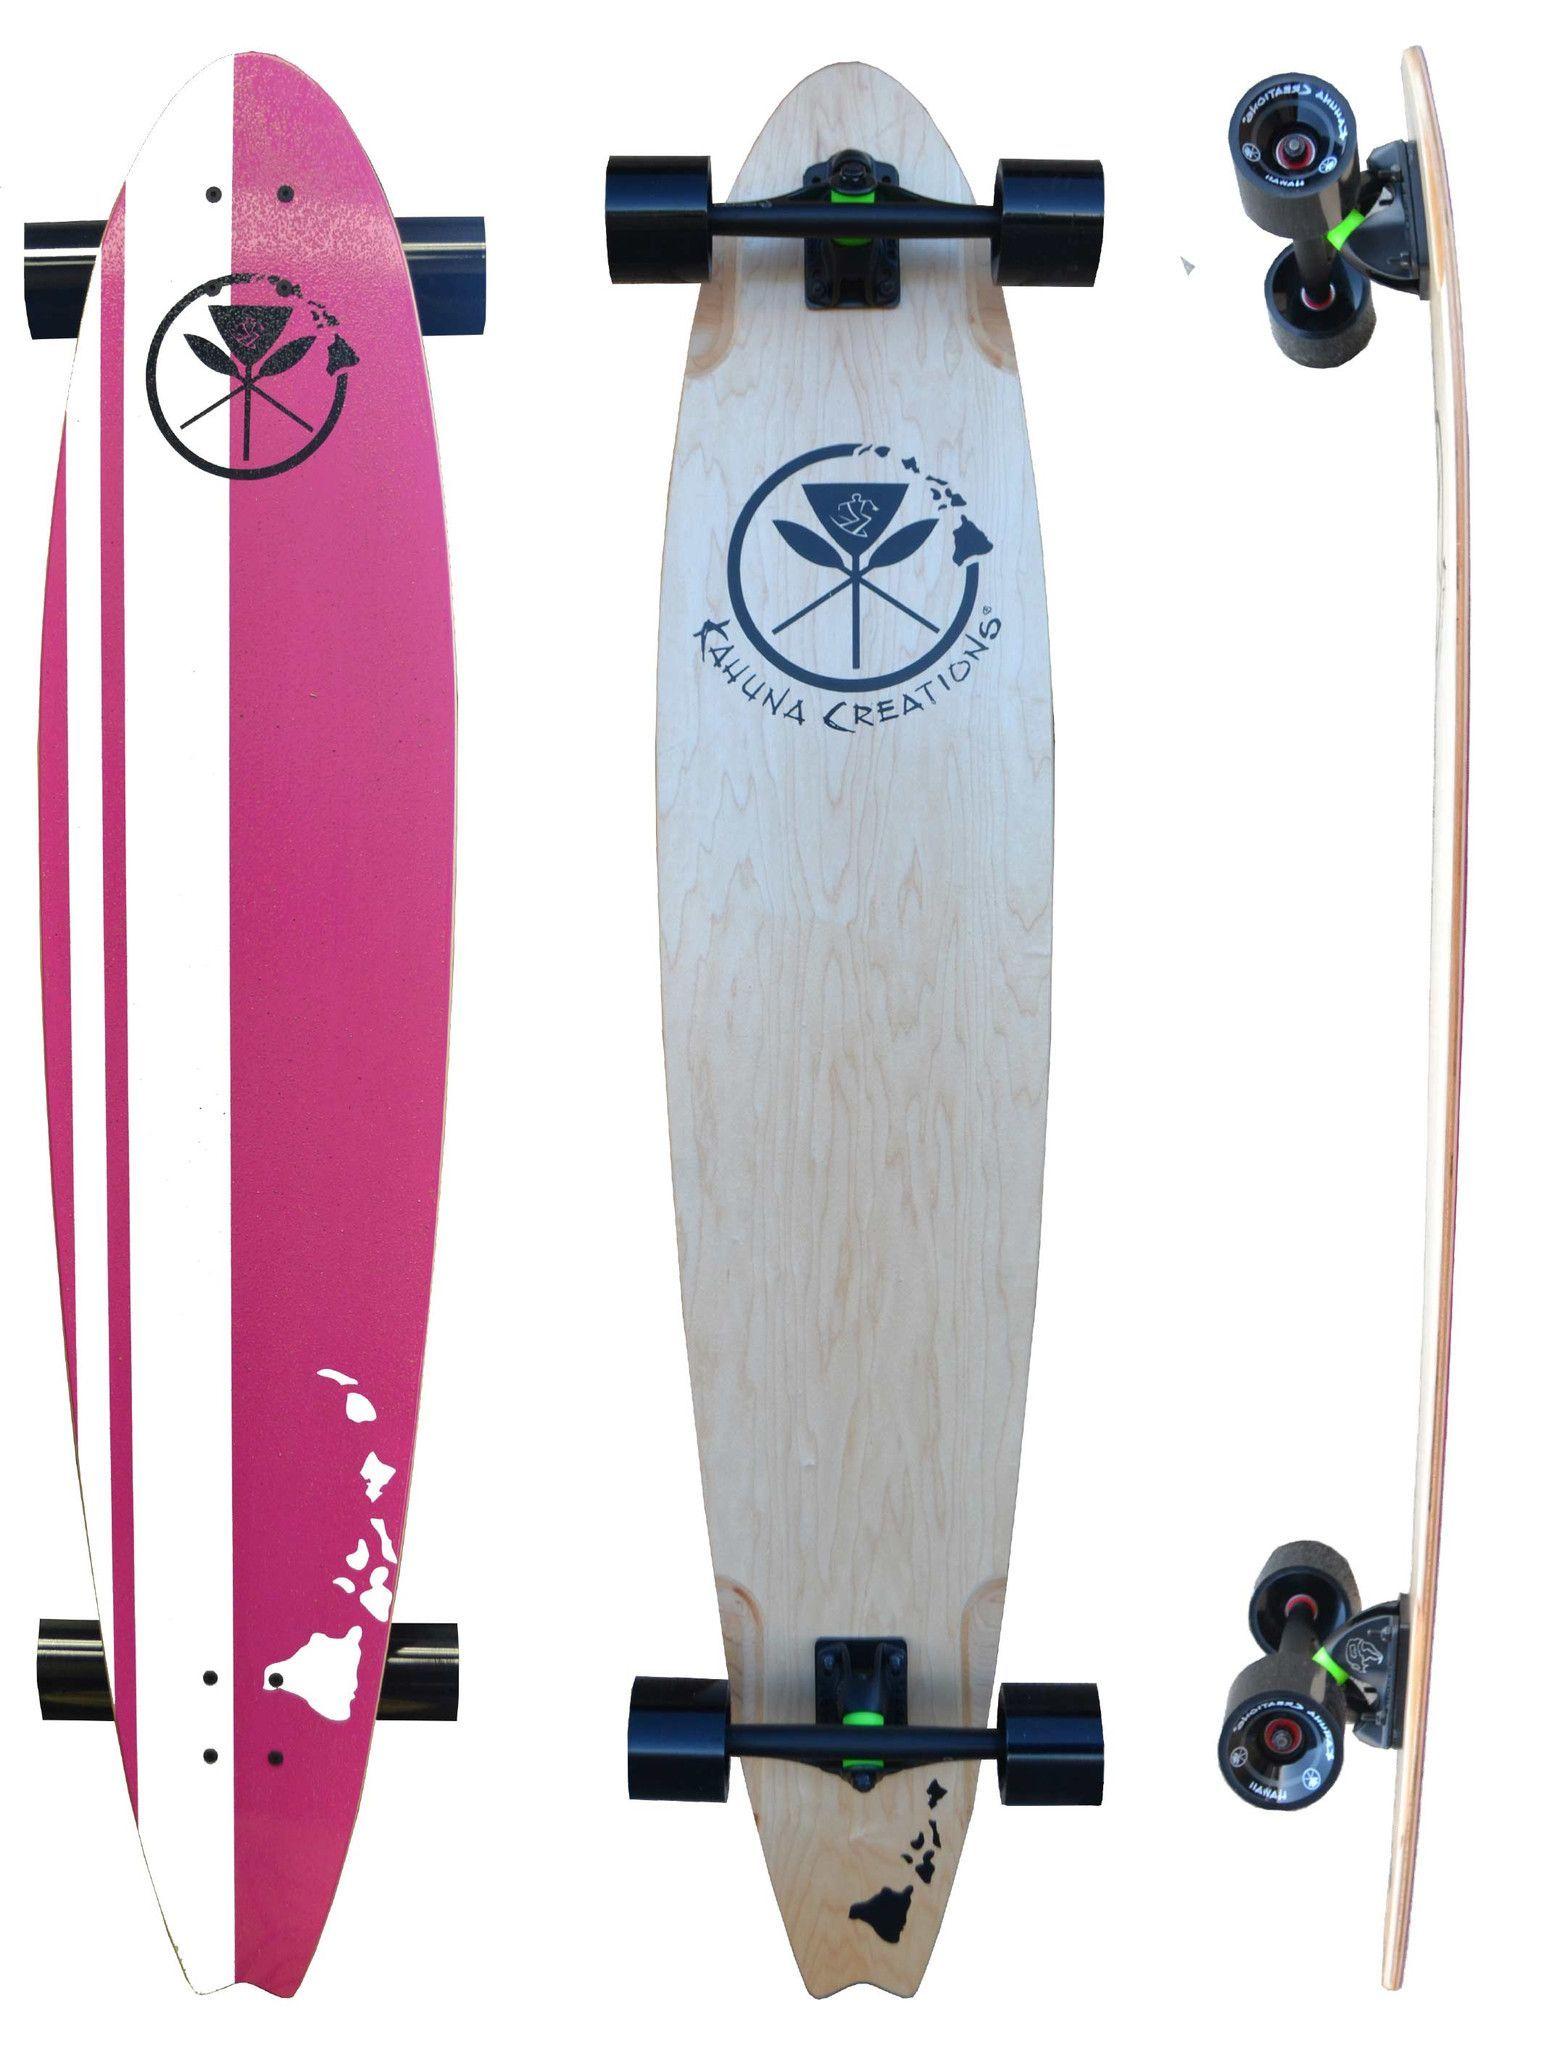 "Retro Pink 48"" Beach Longboard Complete - New Hawaiian Island Design"